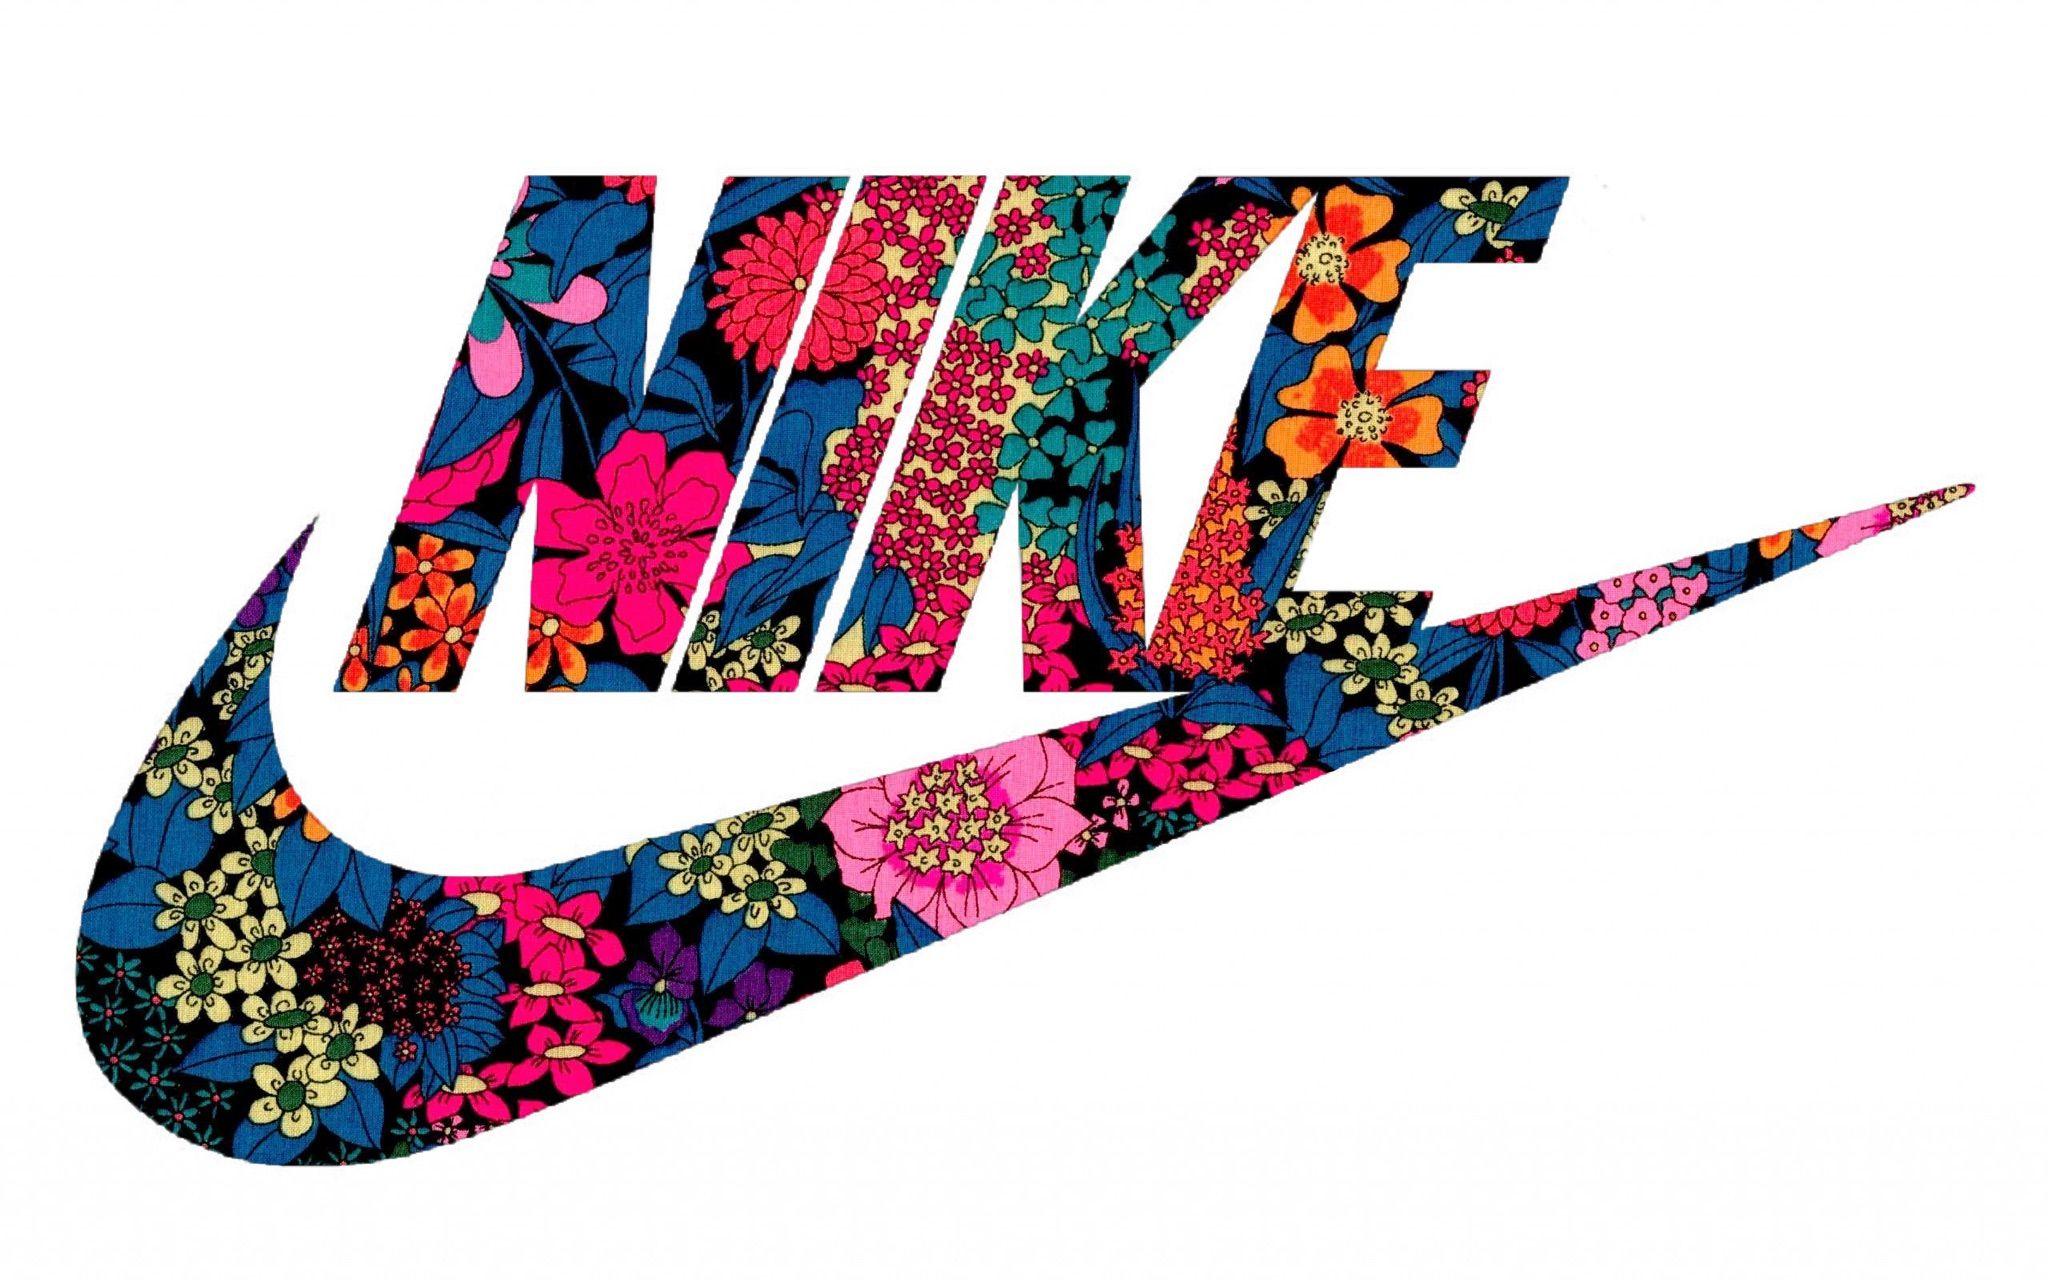 Pin By Katelyn Nielsen On Embroidery Nike Logo Wallpapers Nike Design Nike Wallpaper Awesome nike sb logo wallpaper hd images